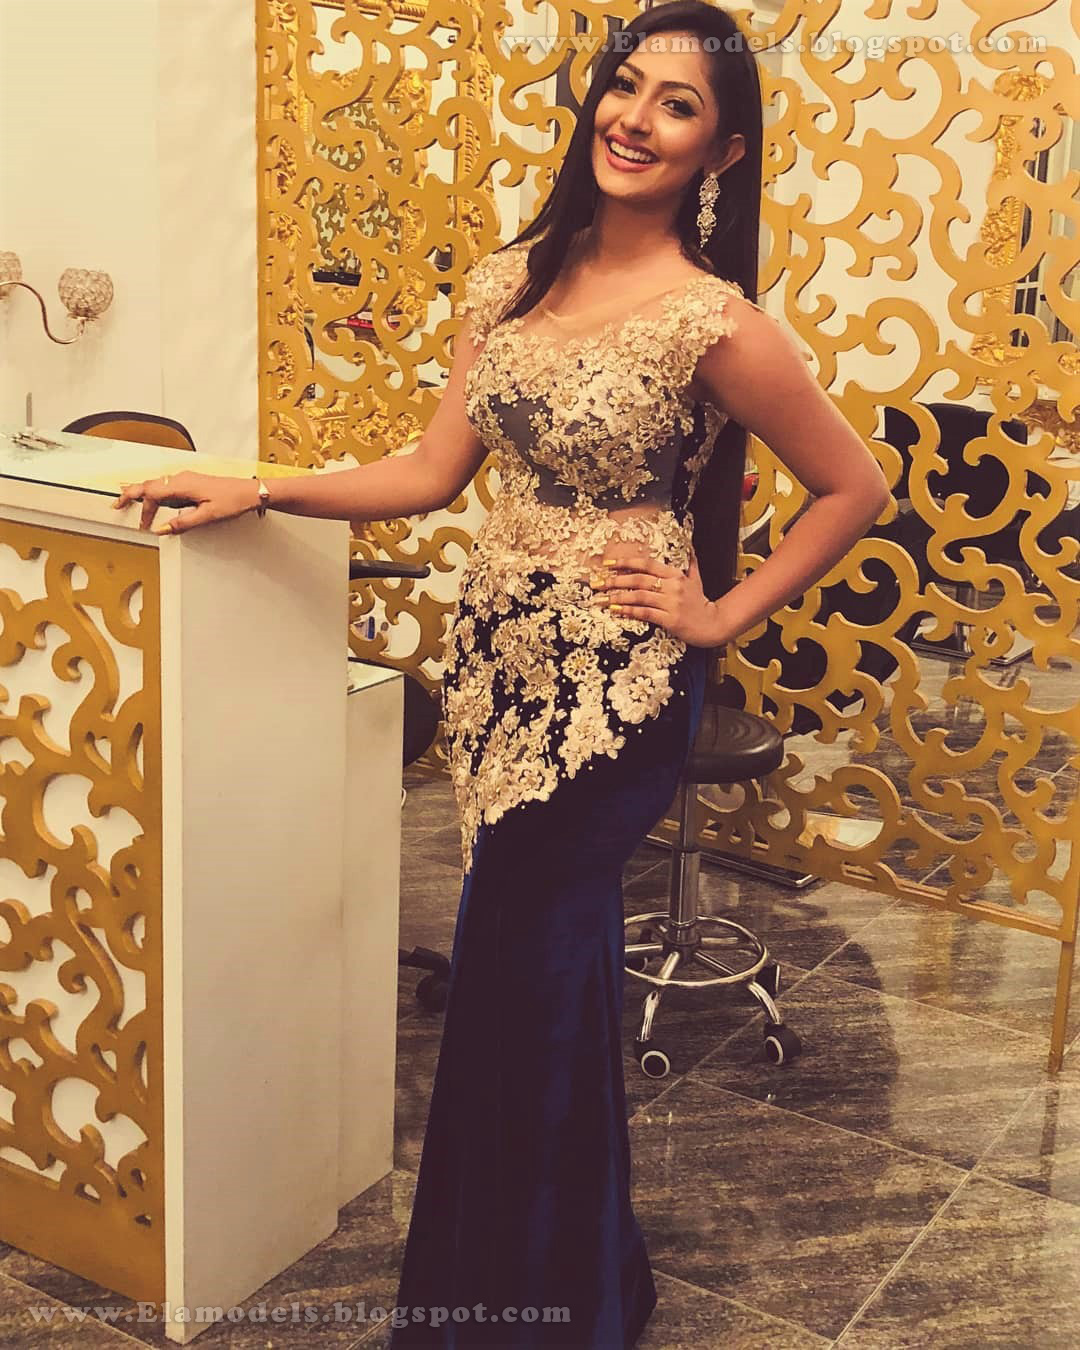 Bmwpanies Latest Models: Nayanathara Wickramarachchi ~ ElaModels